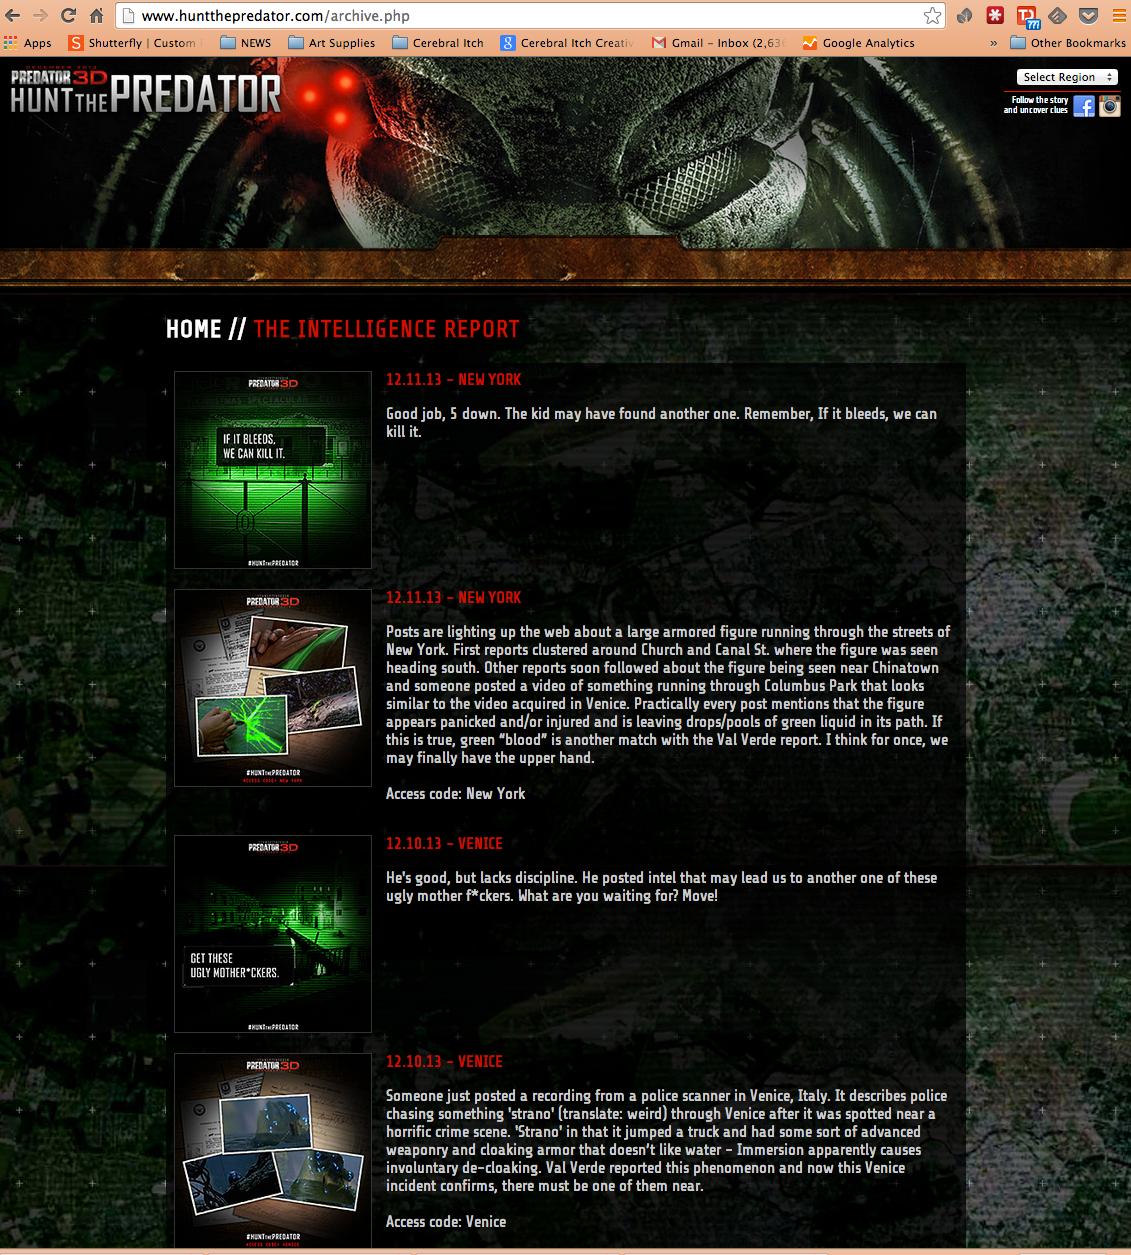 screenshots-2013-12-12-185913-+0000.png